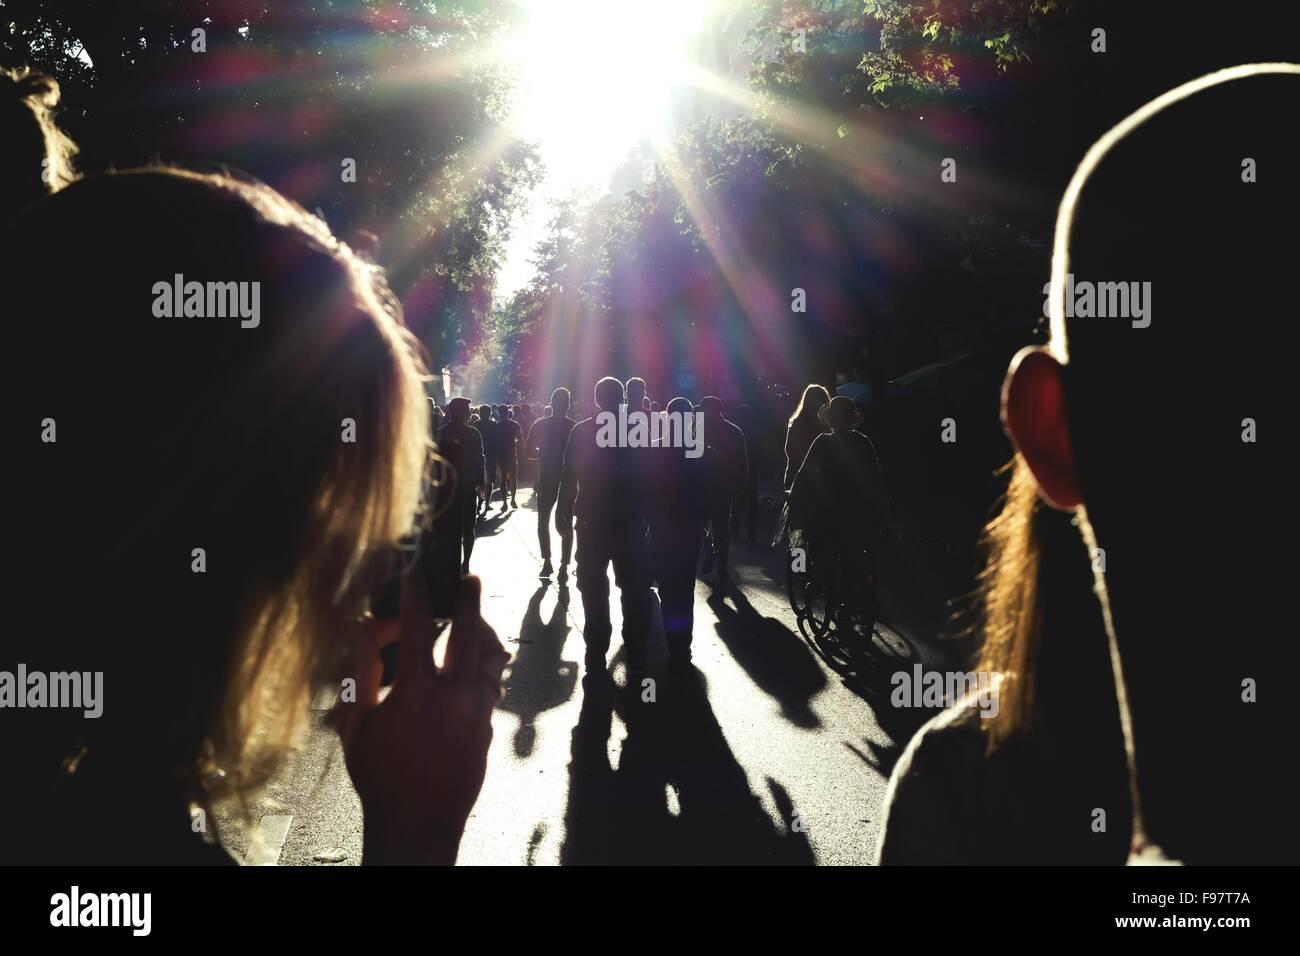 Silhouette People Walking On Road Stock Photo